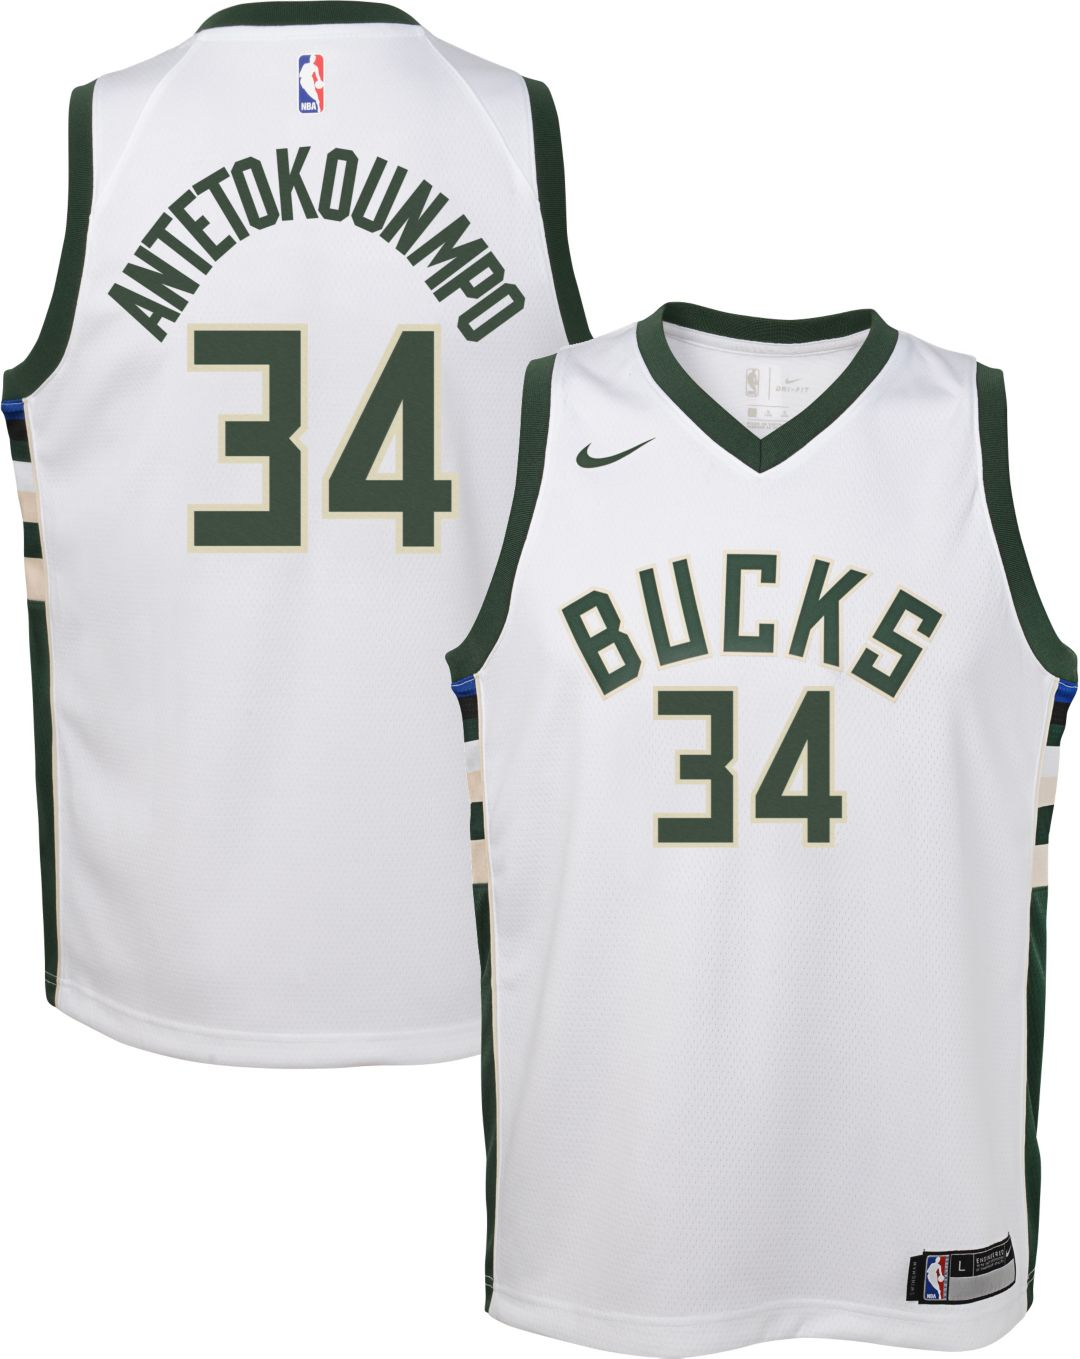 Sporting Goods NEW Milwaukee Bucks #34 Giannis Antetokounmpo Swingman Basketball Jersey Basketball Jerseys